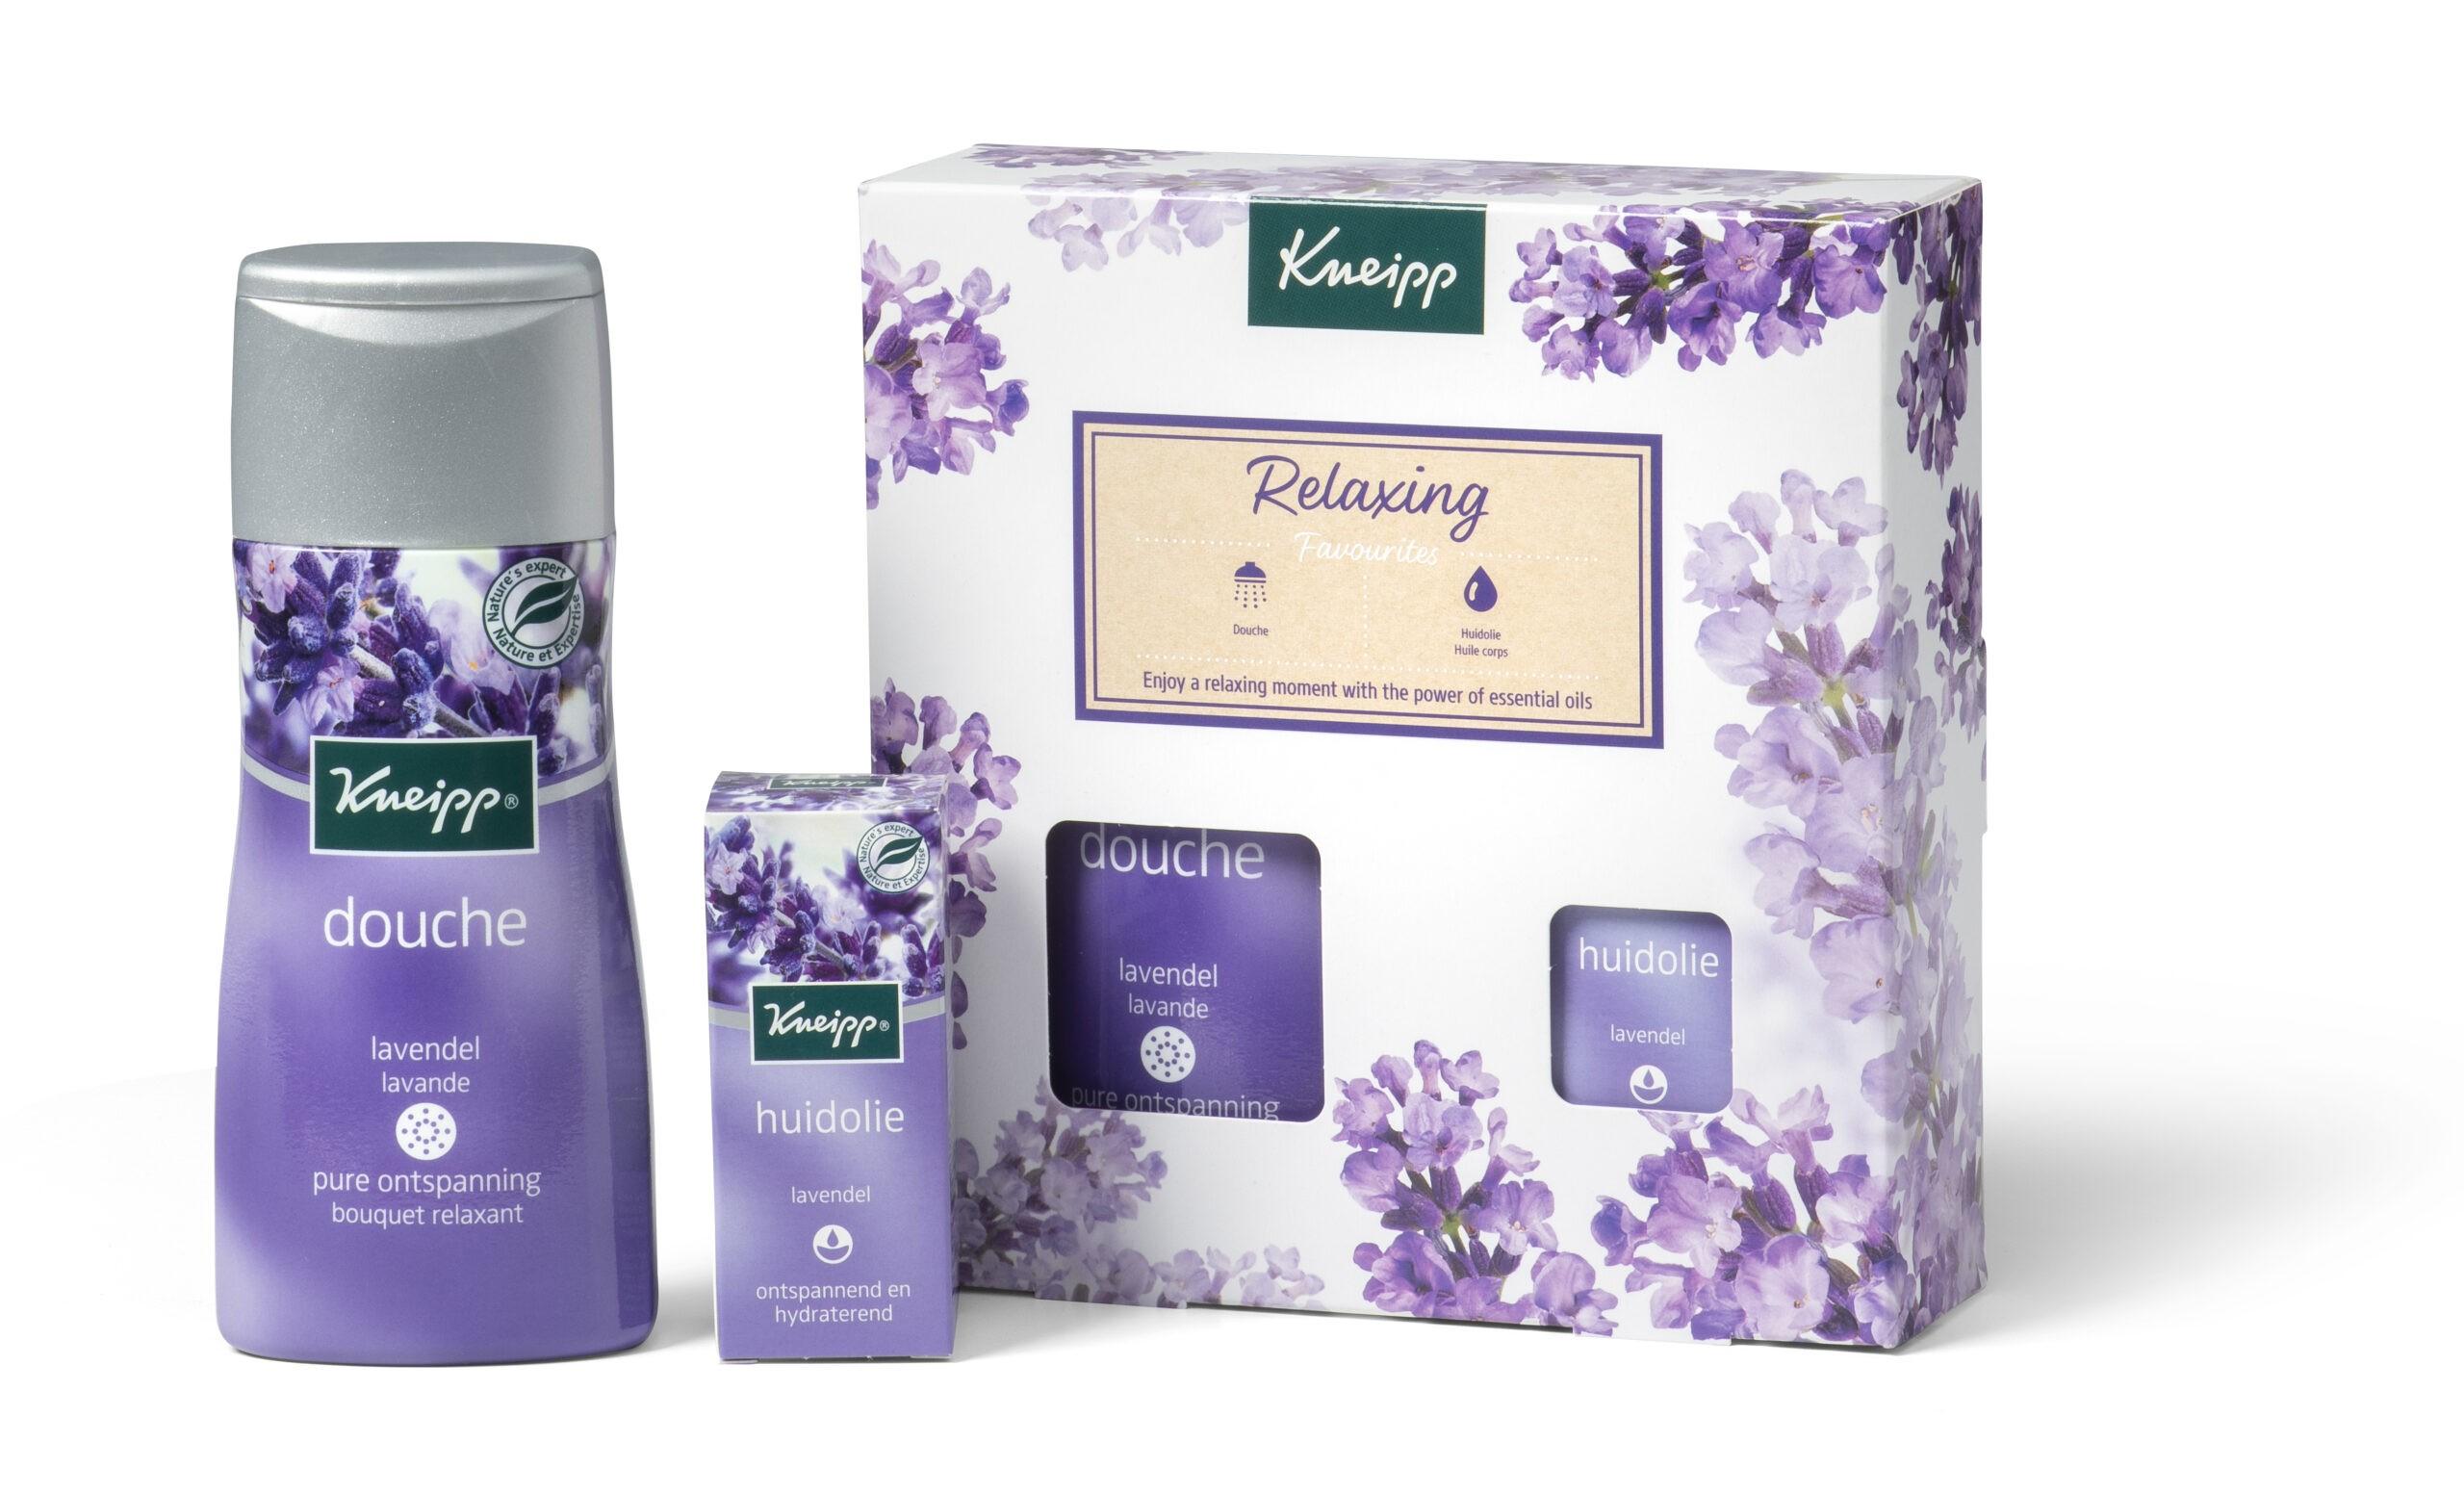 kneipp relaxing lavendel